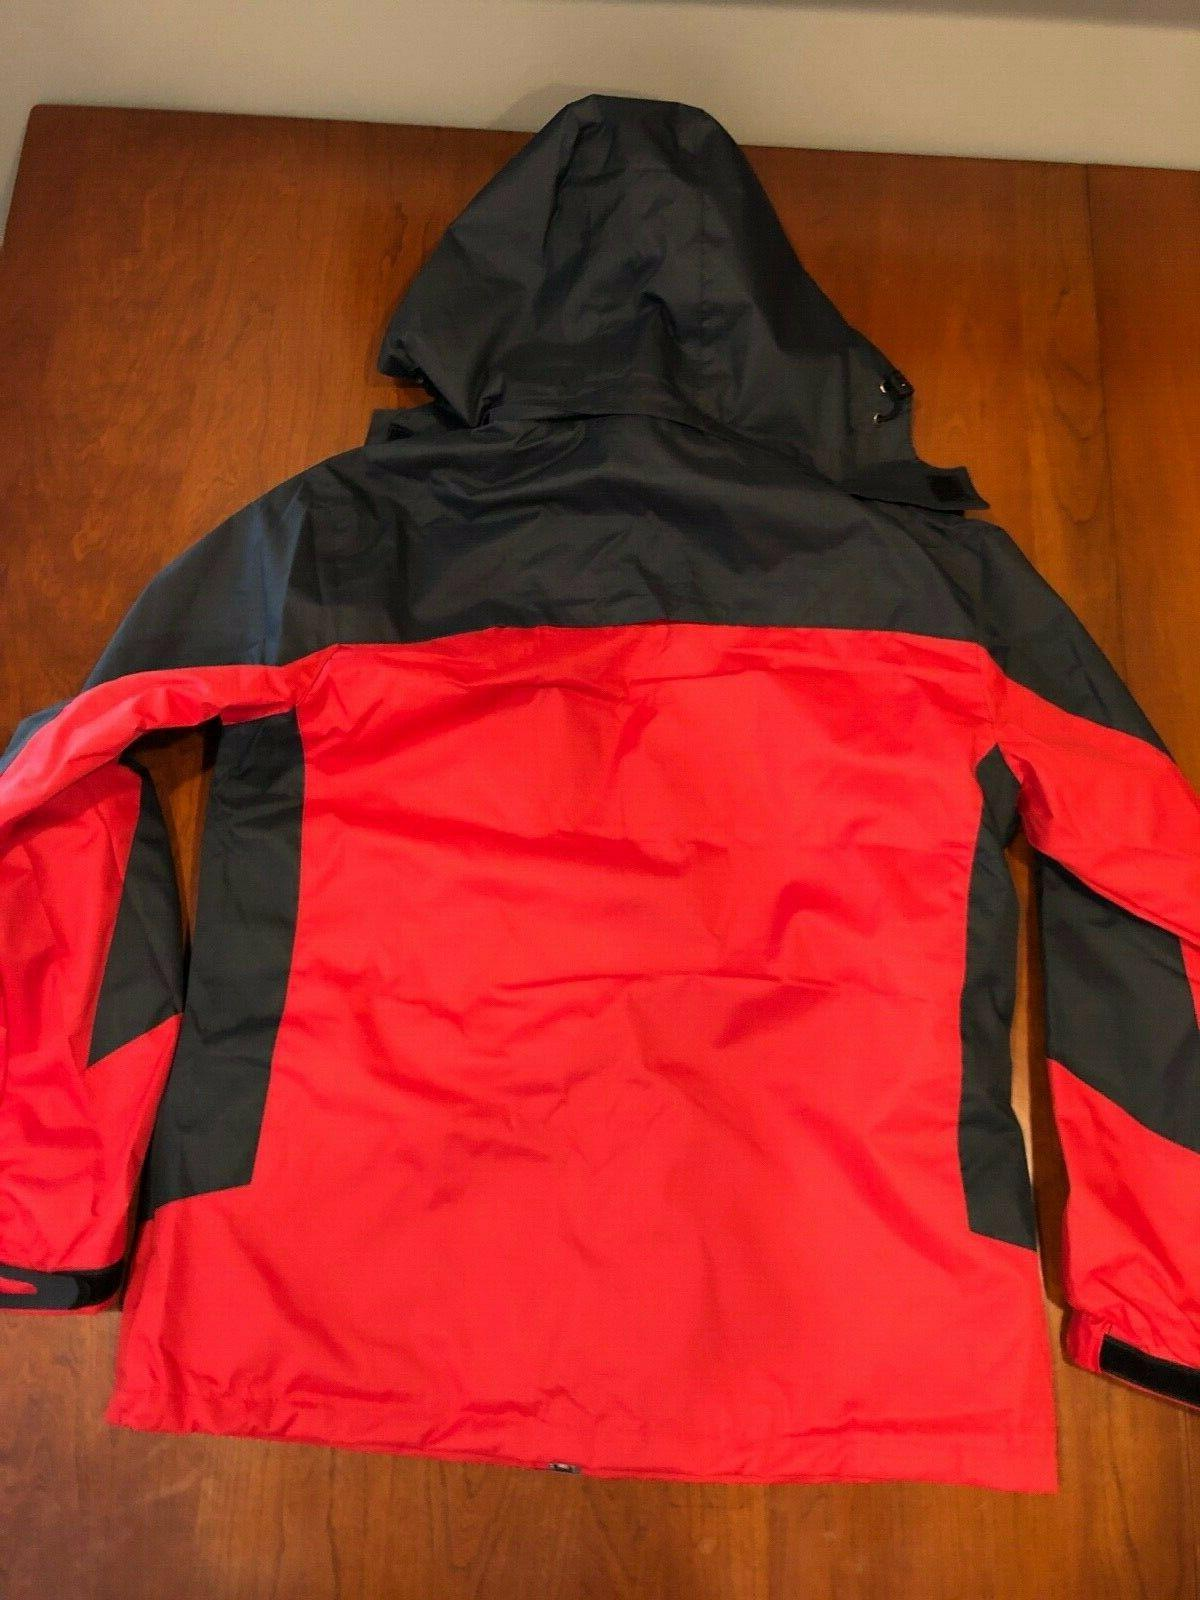 MAGCOMSEN Men's Hiking Ski Jacket Size M